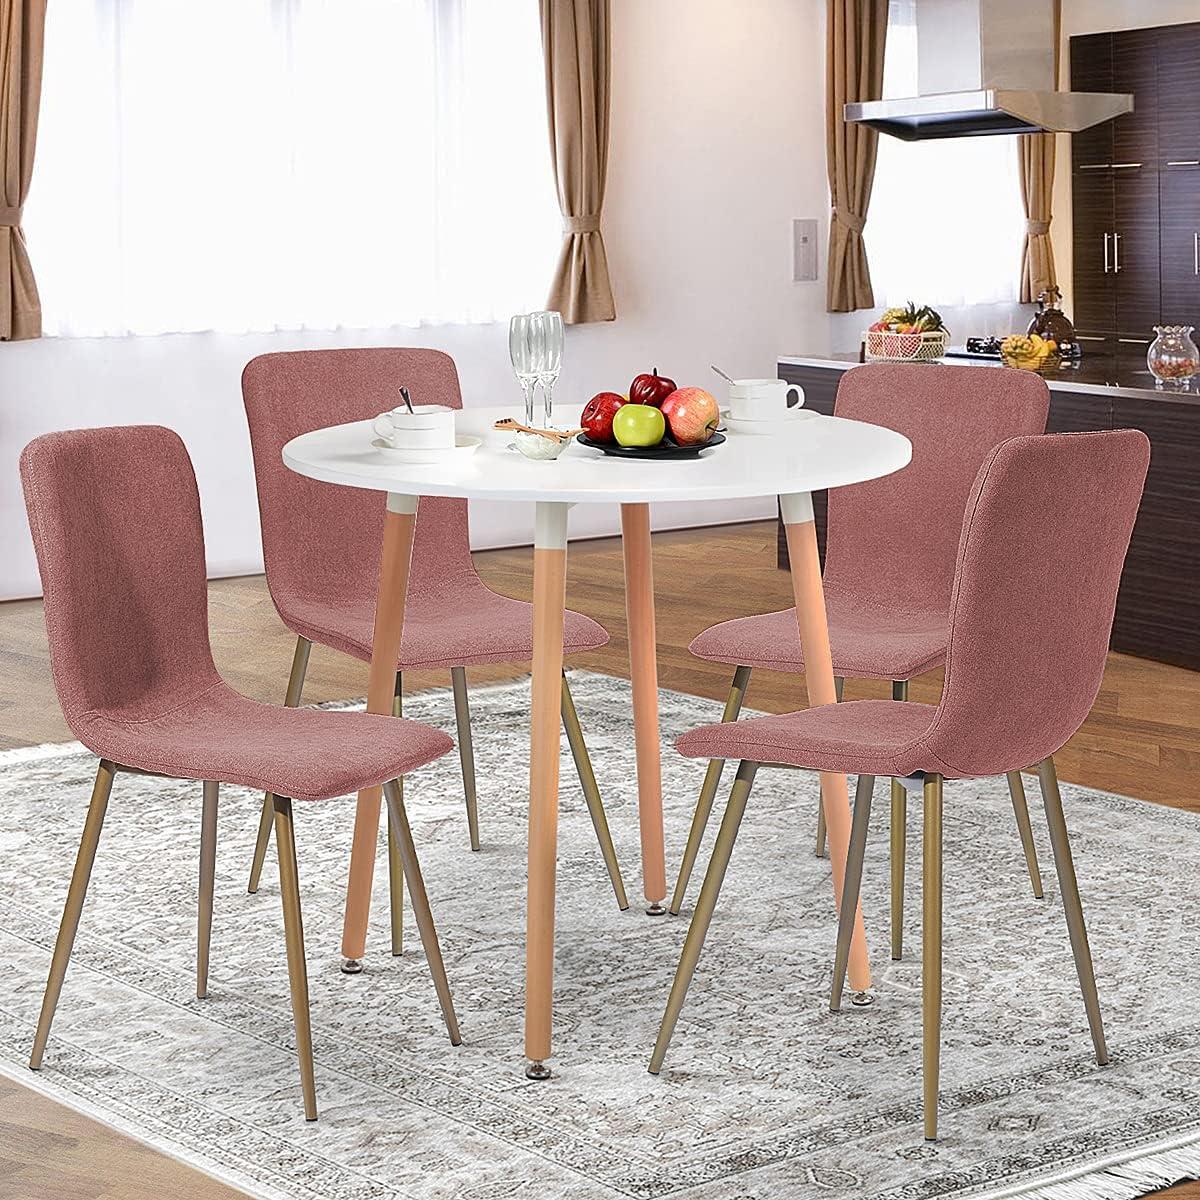 Geniqua 4 X Modern Albuquerque Mall Dining Chair Max 66% OFF Fabri Linen Coral Pink High Back